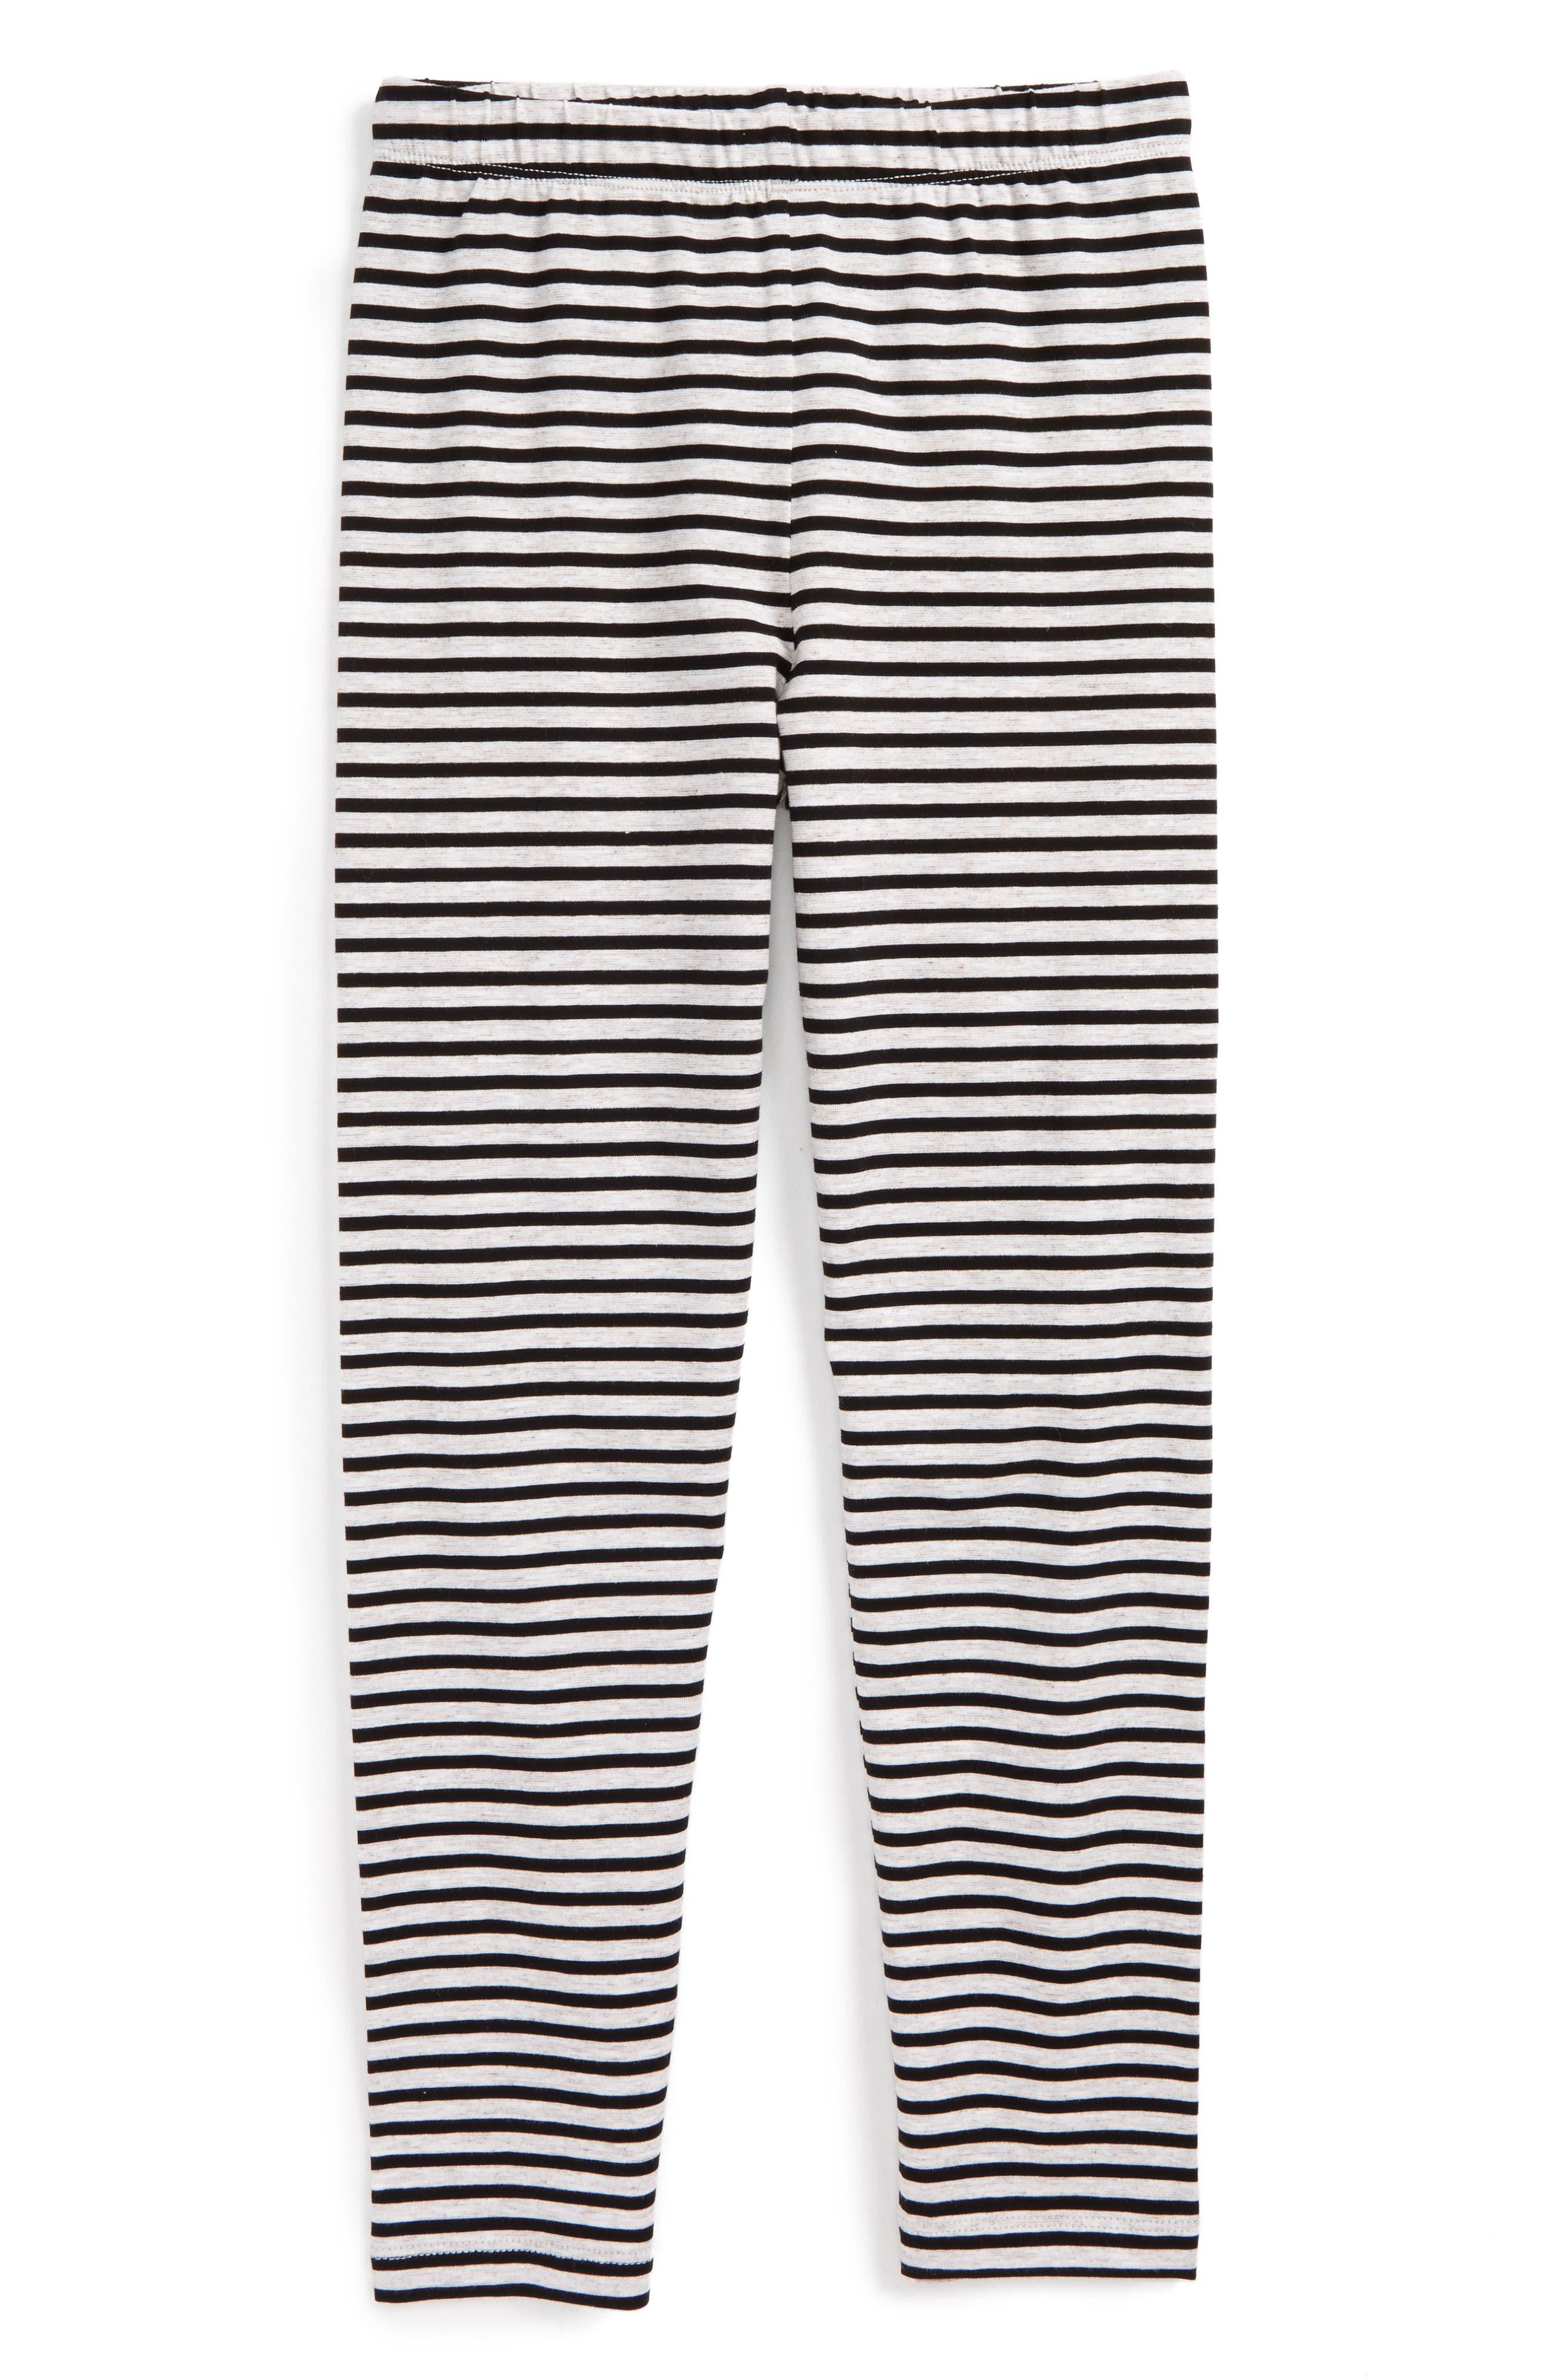 Stripe Leggings,                         Main,                         color, Black/ White